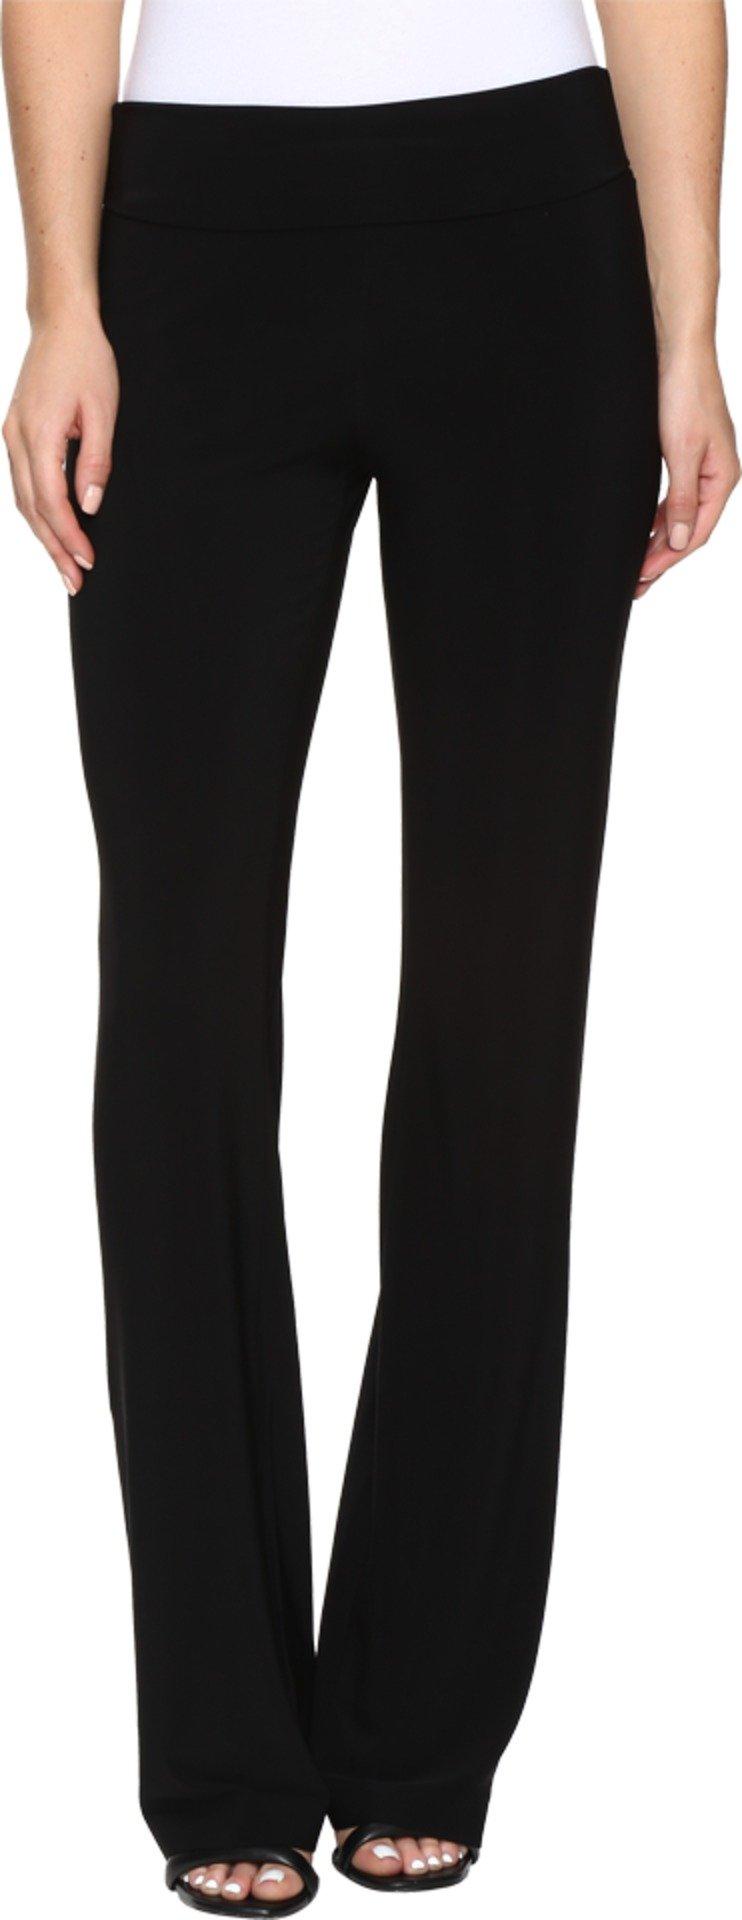 KAMALIKULTURE by Norma Kamali Women's Boot Pants Black Pants